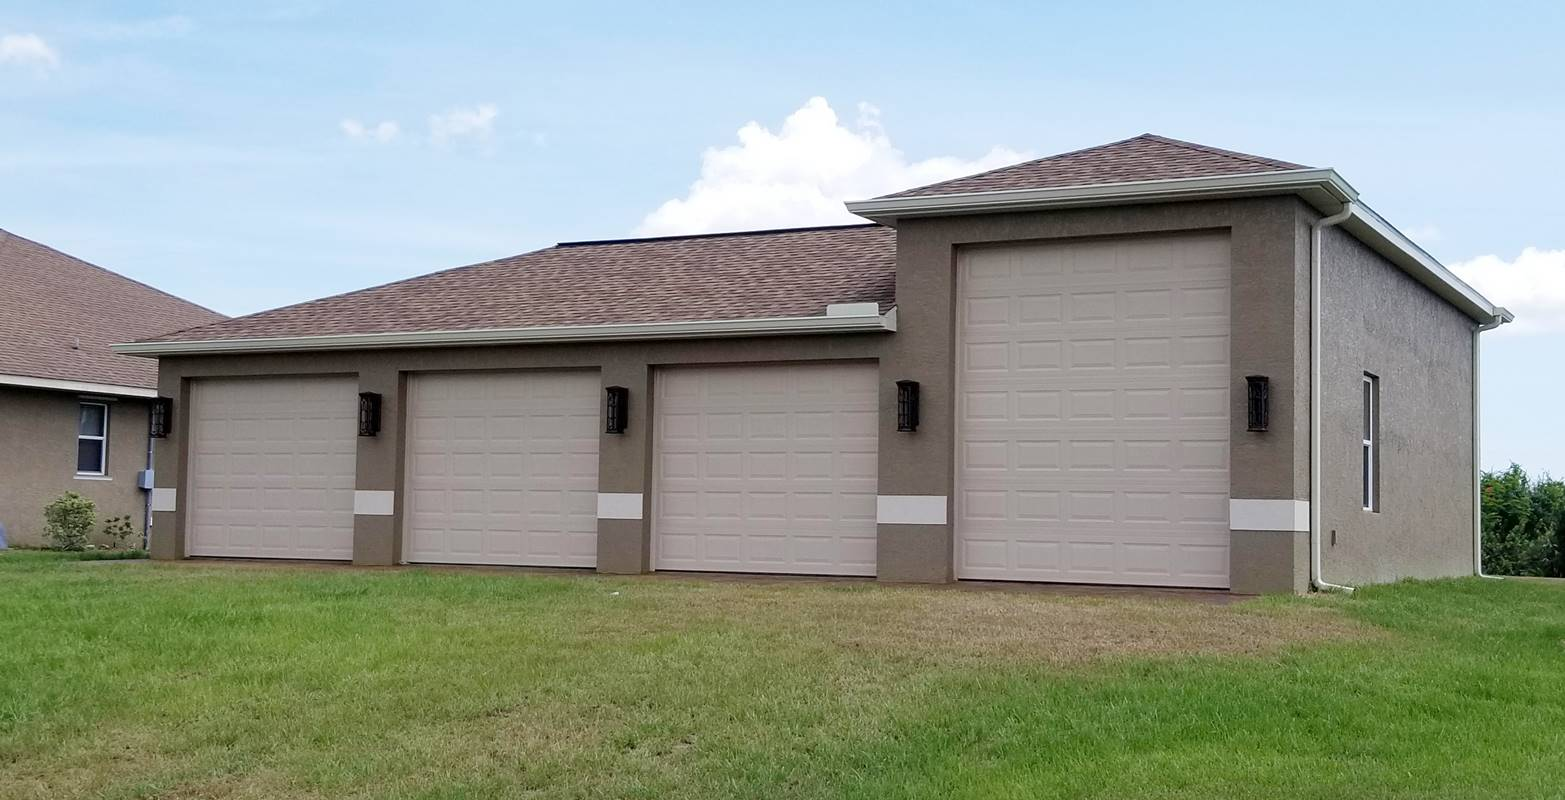 Garage-additions-in-North-Port-Sarasota-County